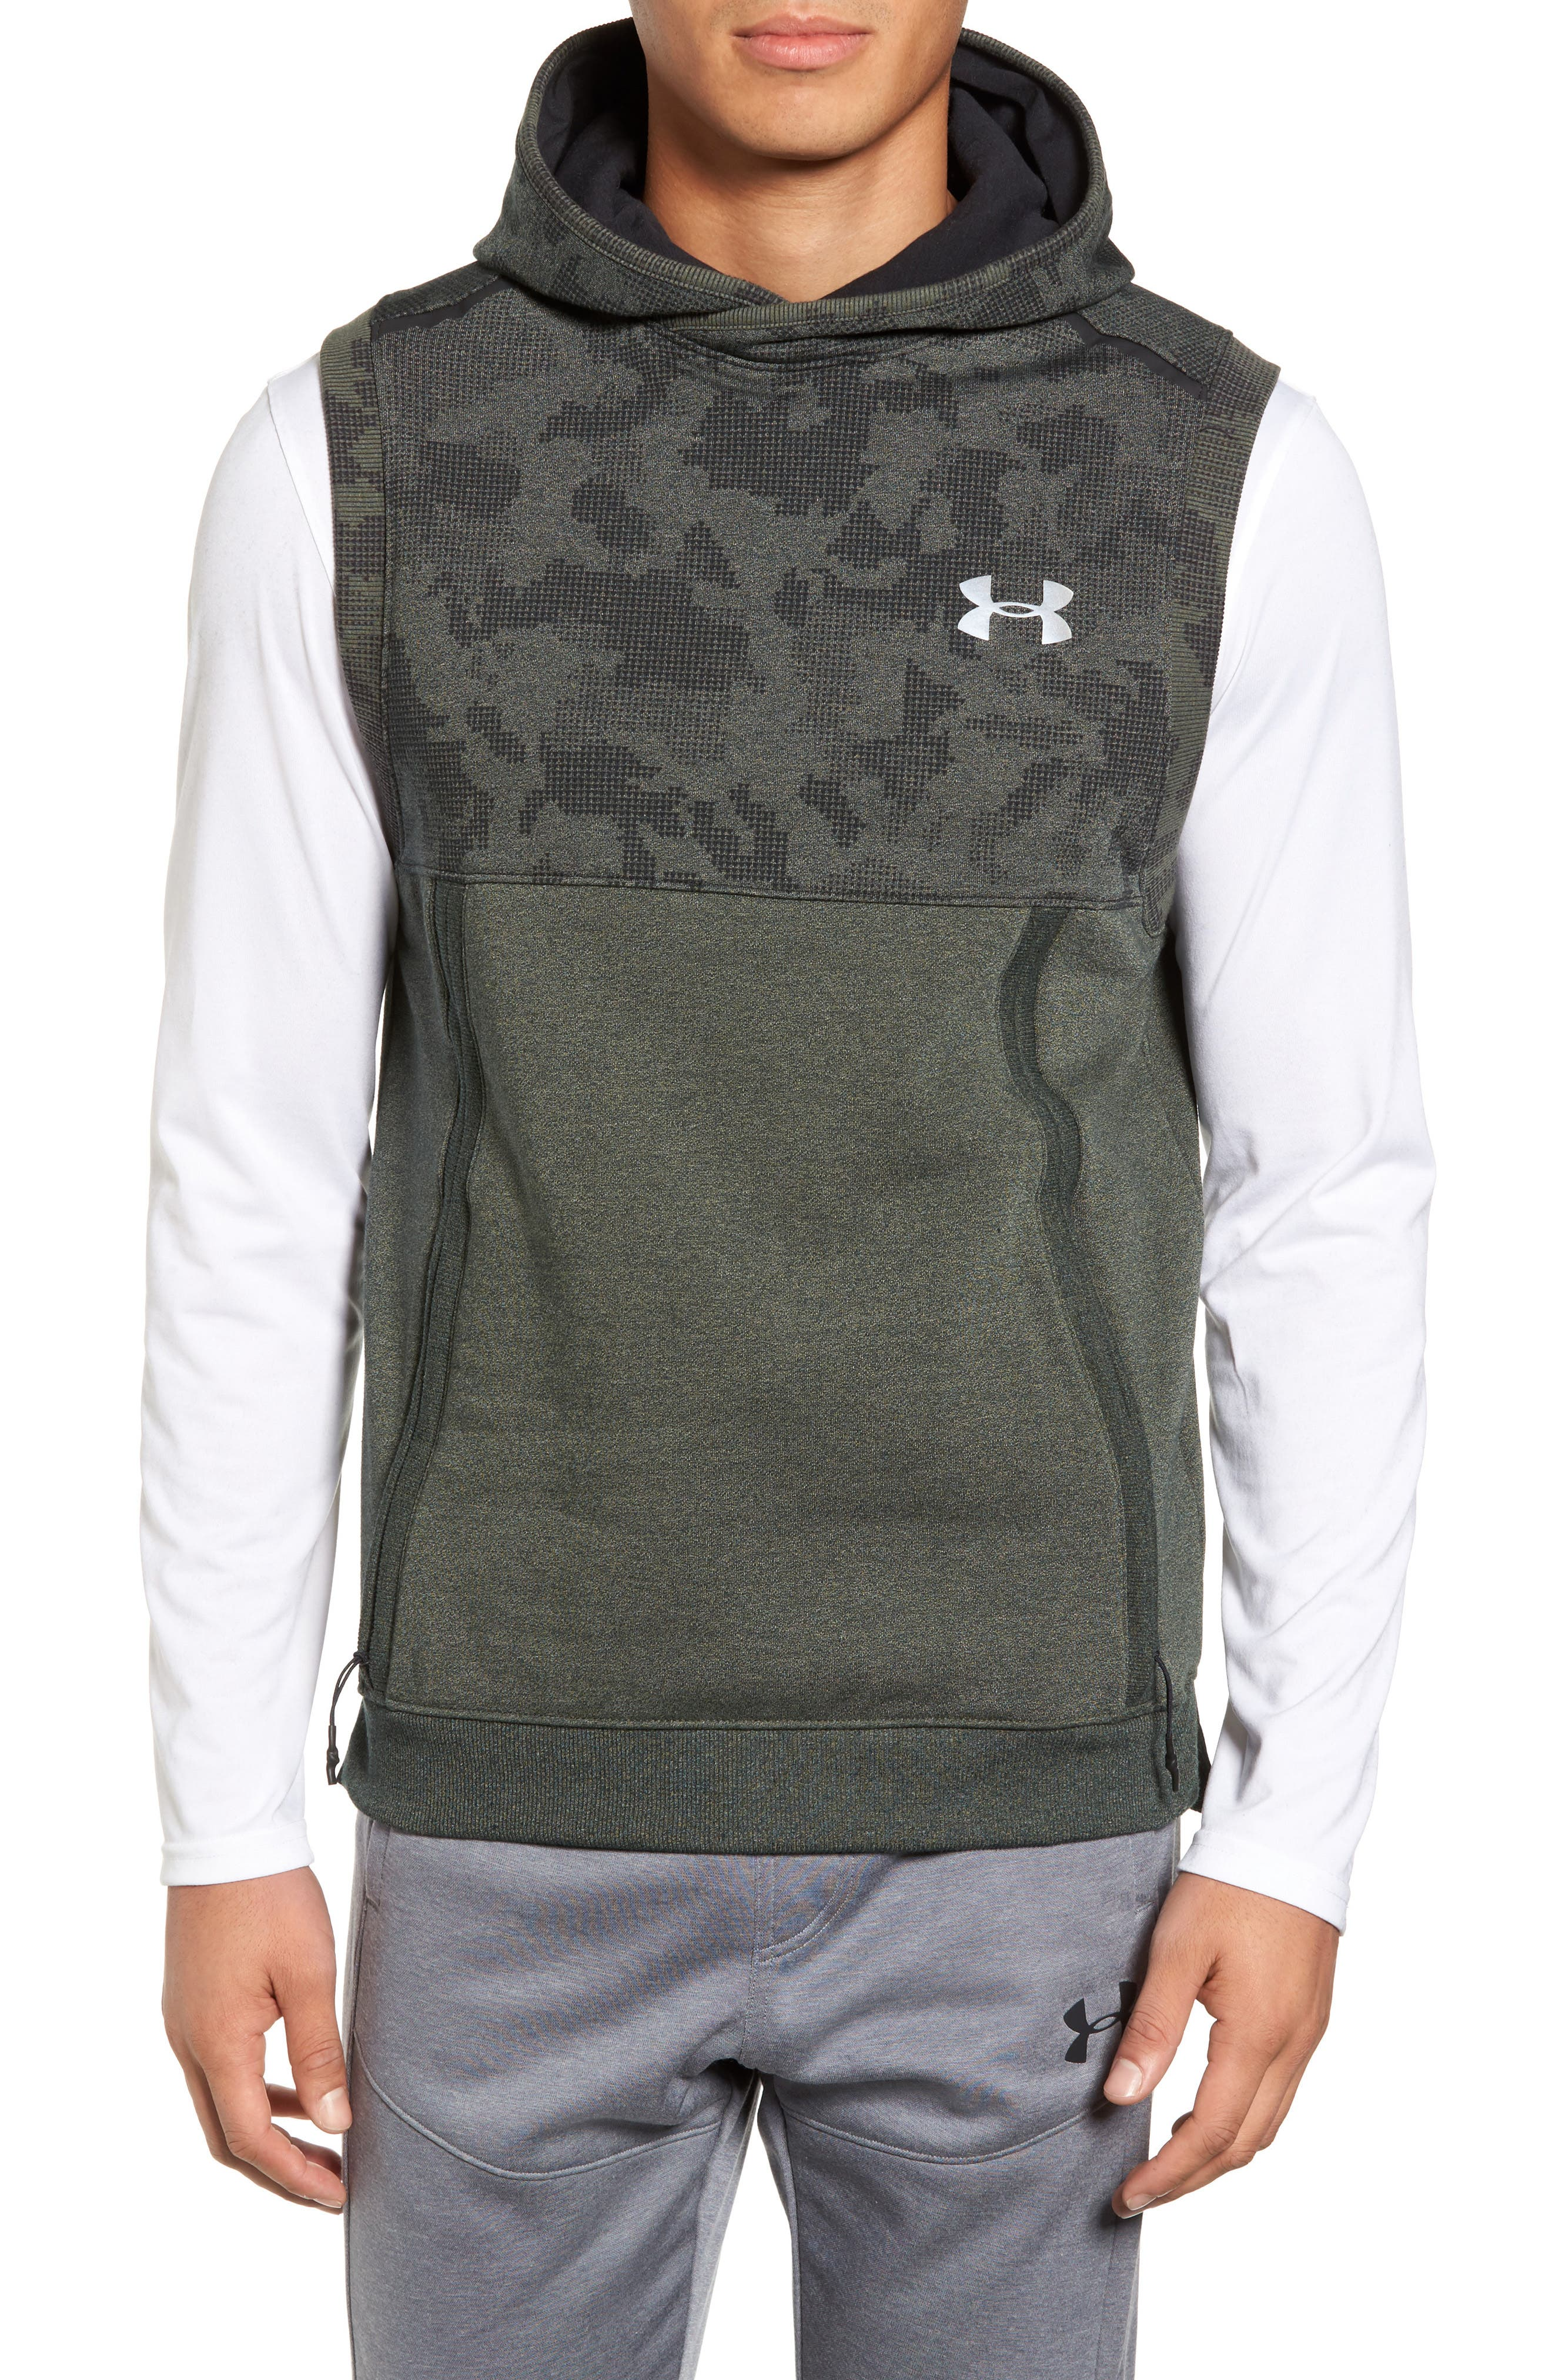 Alternate Image 1 Selected - Under Armour Threadborne Hooded Vest